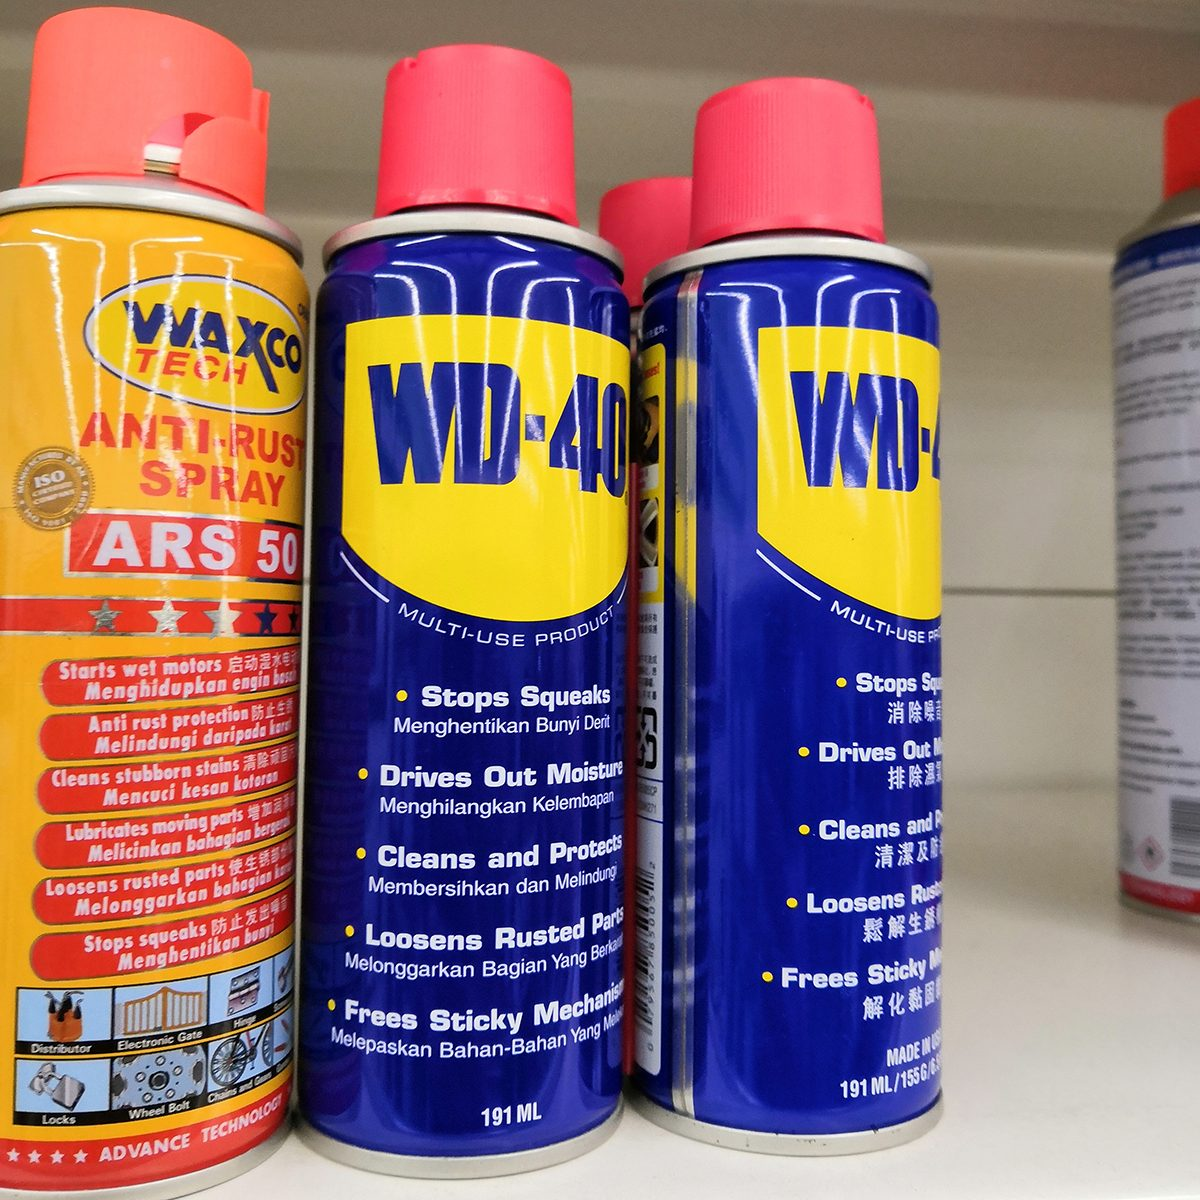 A bottles WD 40 lubes brand display at supermarket shelf.